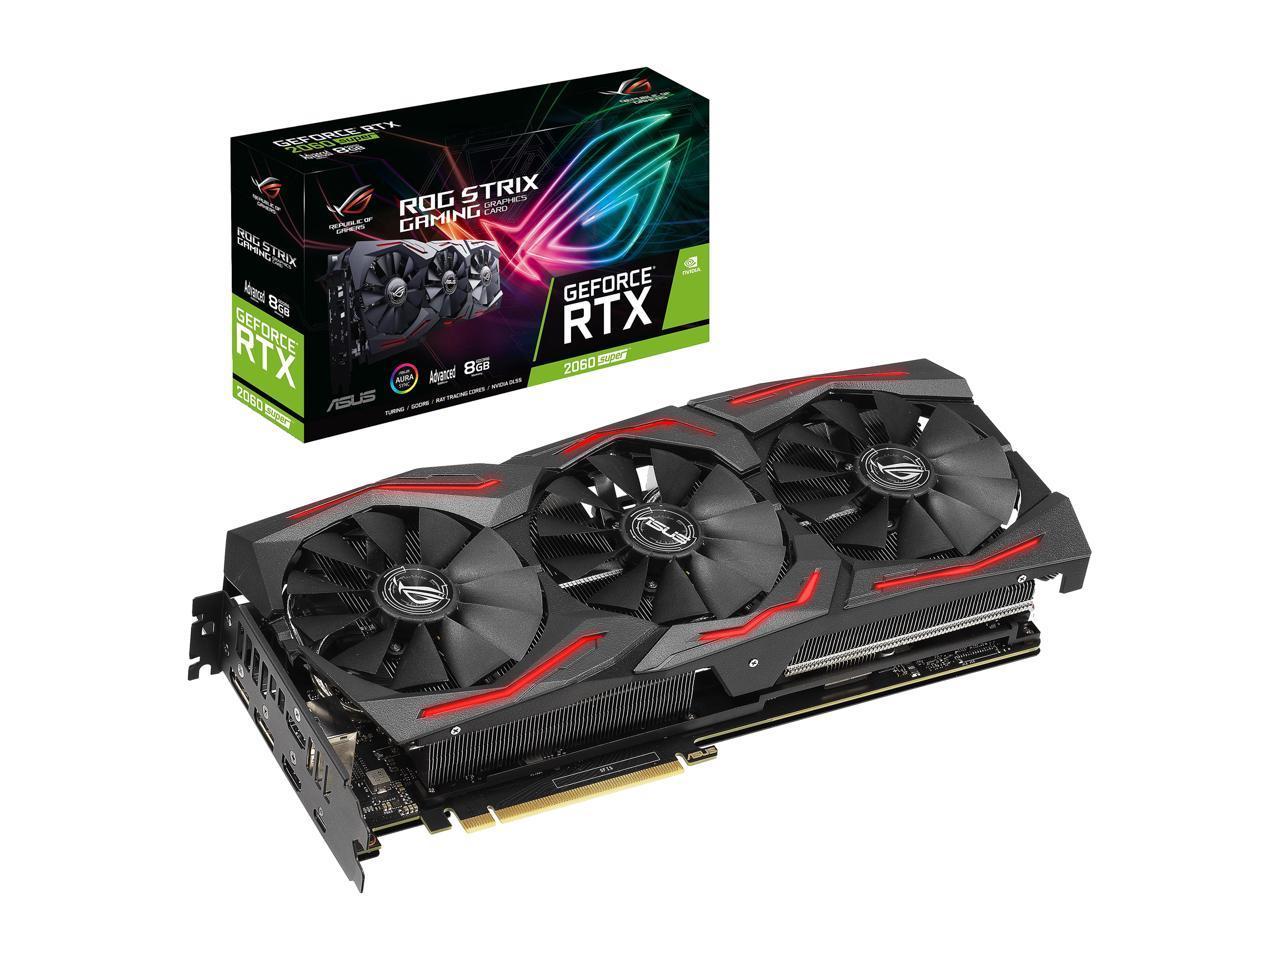 ROG-STRIX-RTX2060S-A8G-GAMING